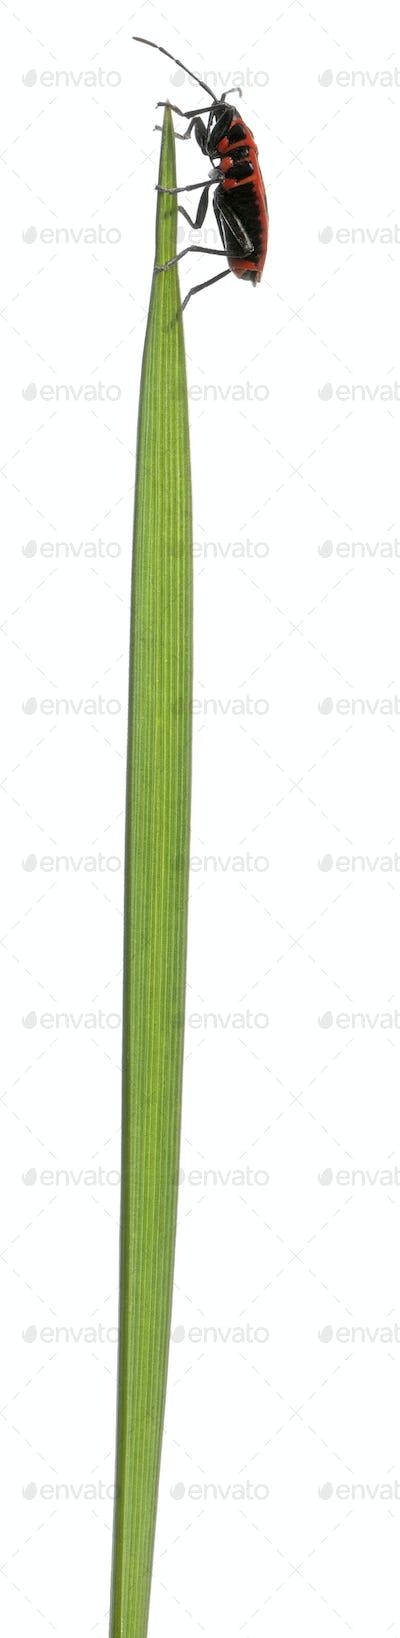 Scentless plant bug, Corizus hyoscyami, on blade of grass against white background